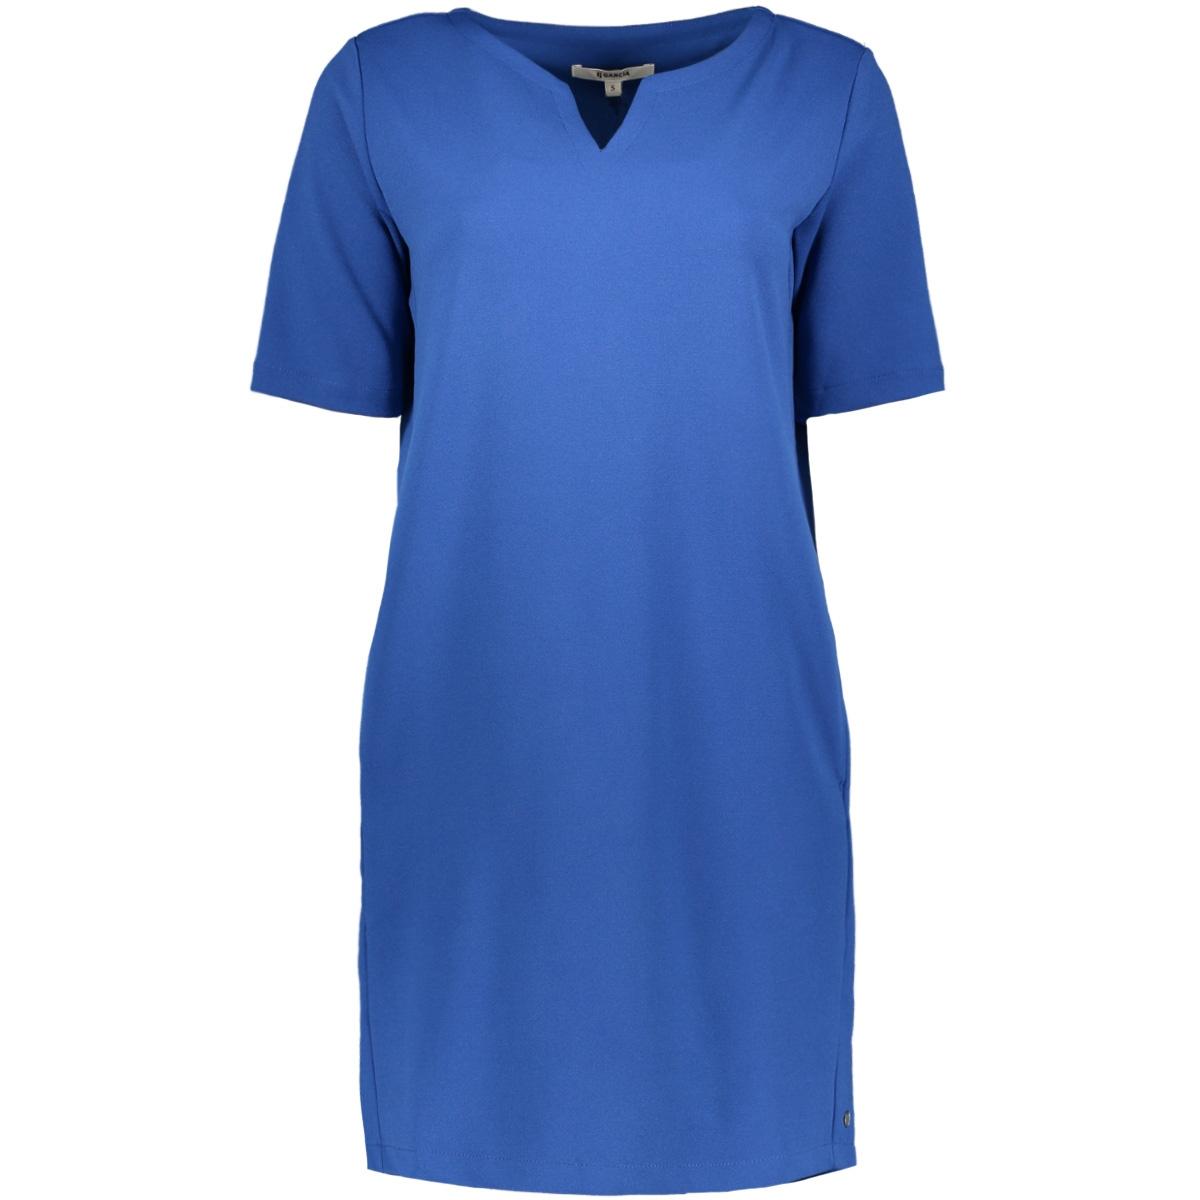 gs900280 garcia jurk 2868 classic blue